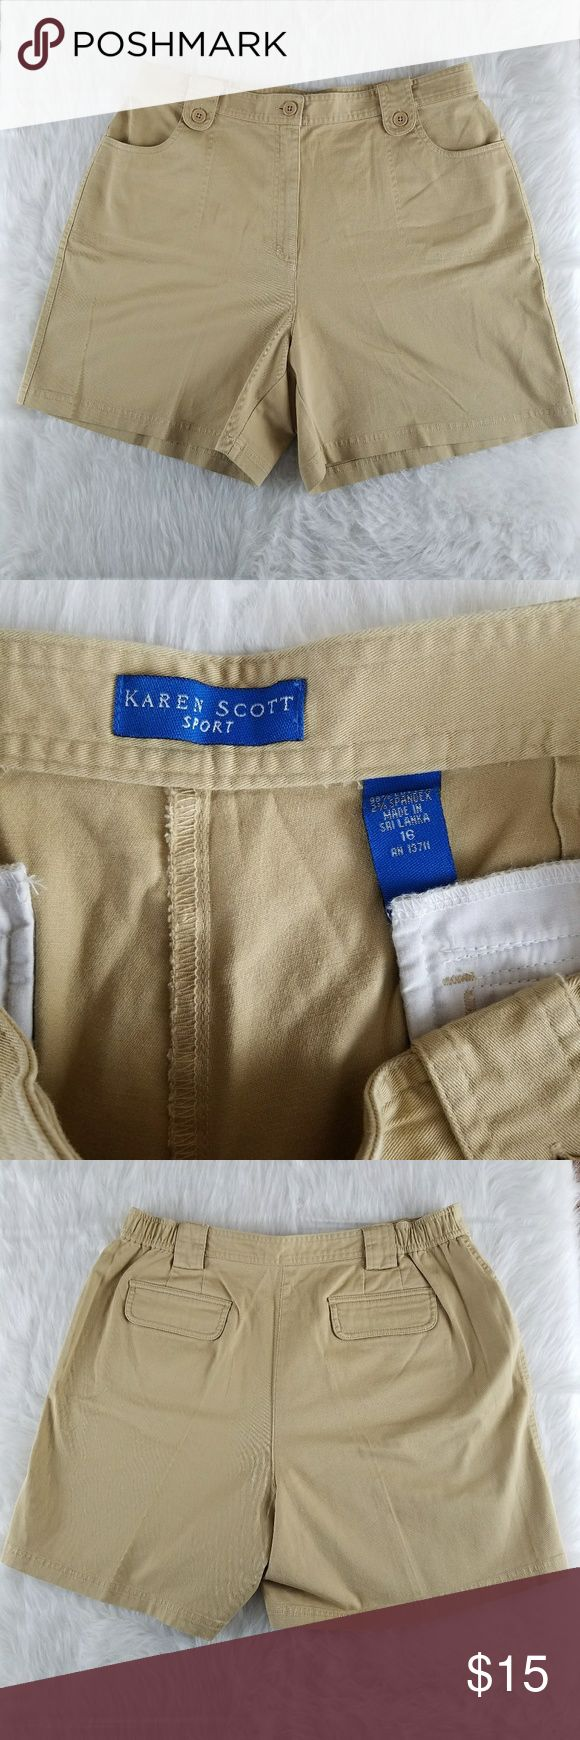 Karen Scott Sport shorts size 16 These are Karen Scott.Sport shorts in a khaki brown tan color. SIZE 16 Karen Scott Shorts